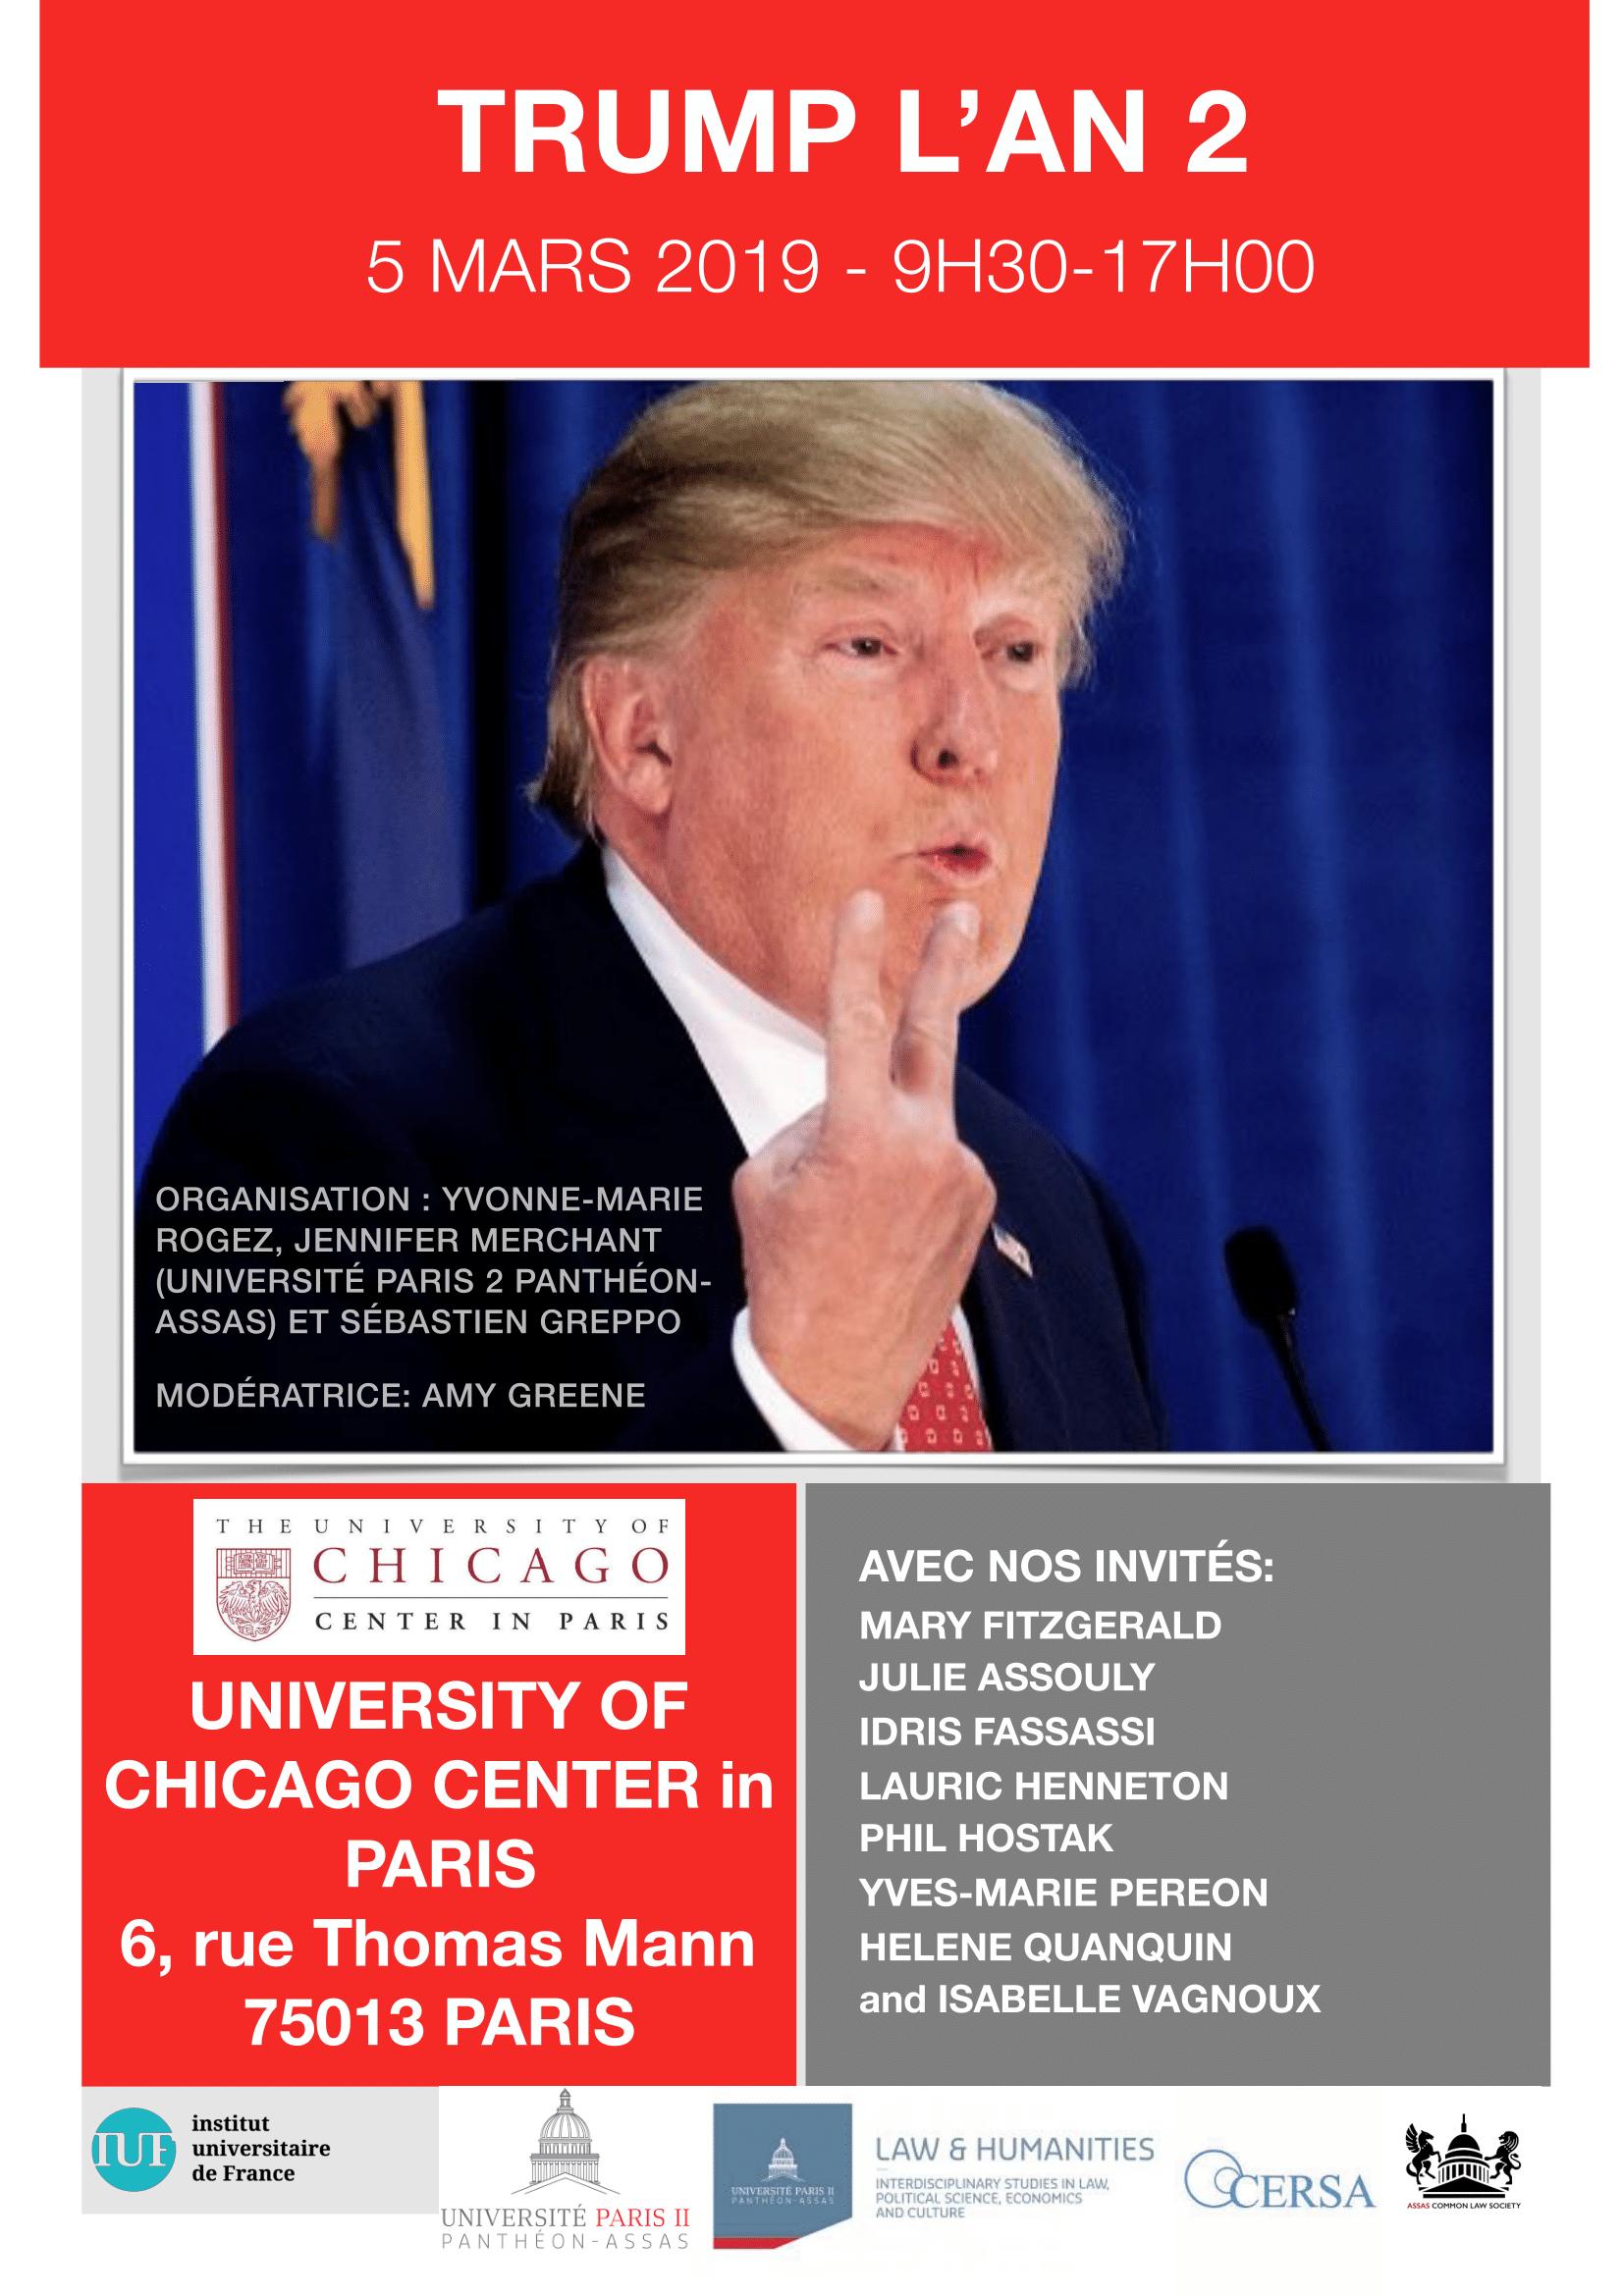 Affiche Trump, year 2 - Trump, l'an 2